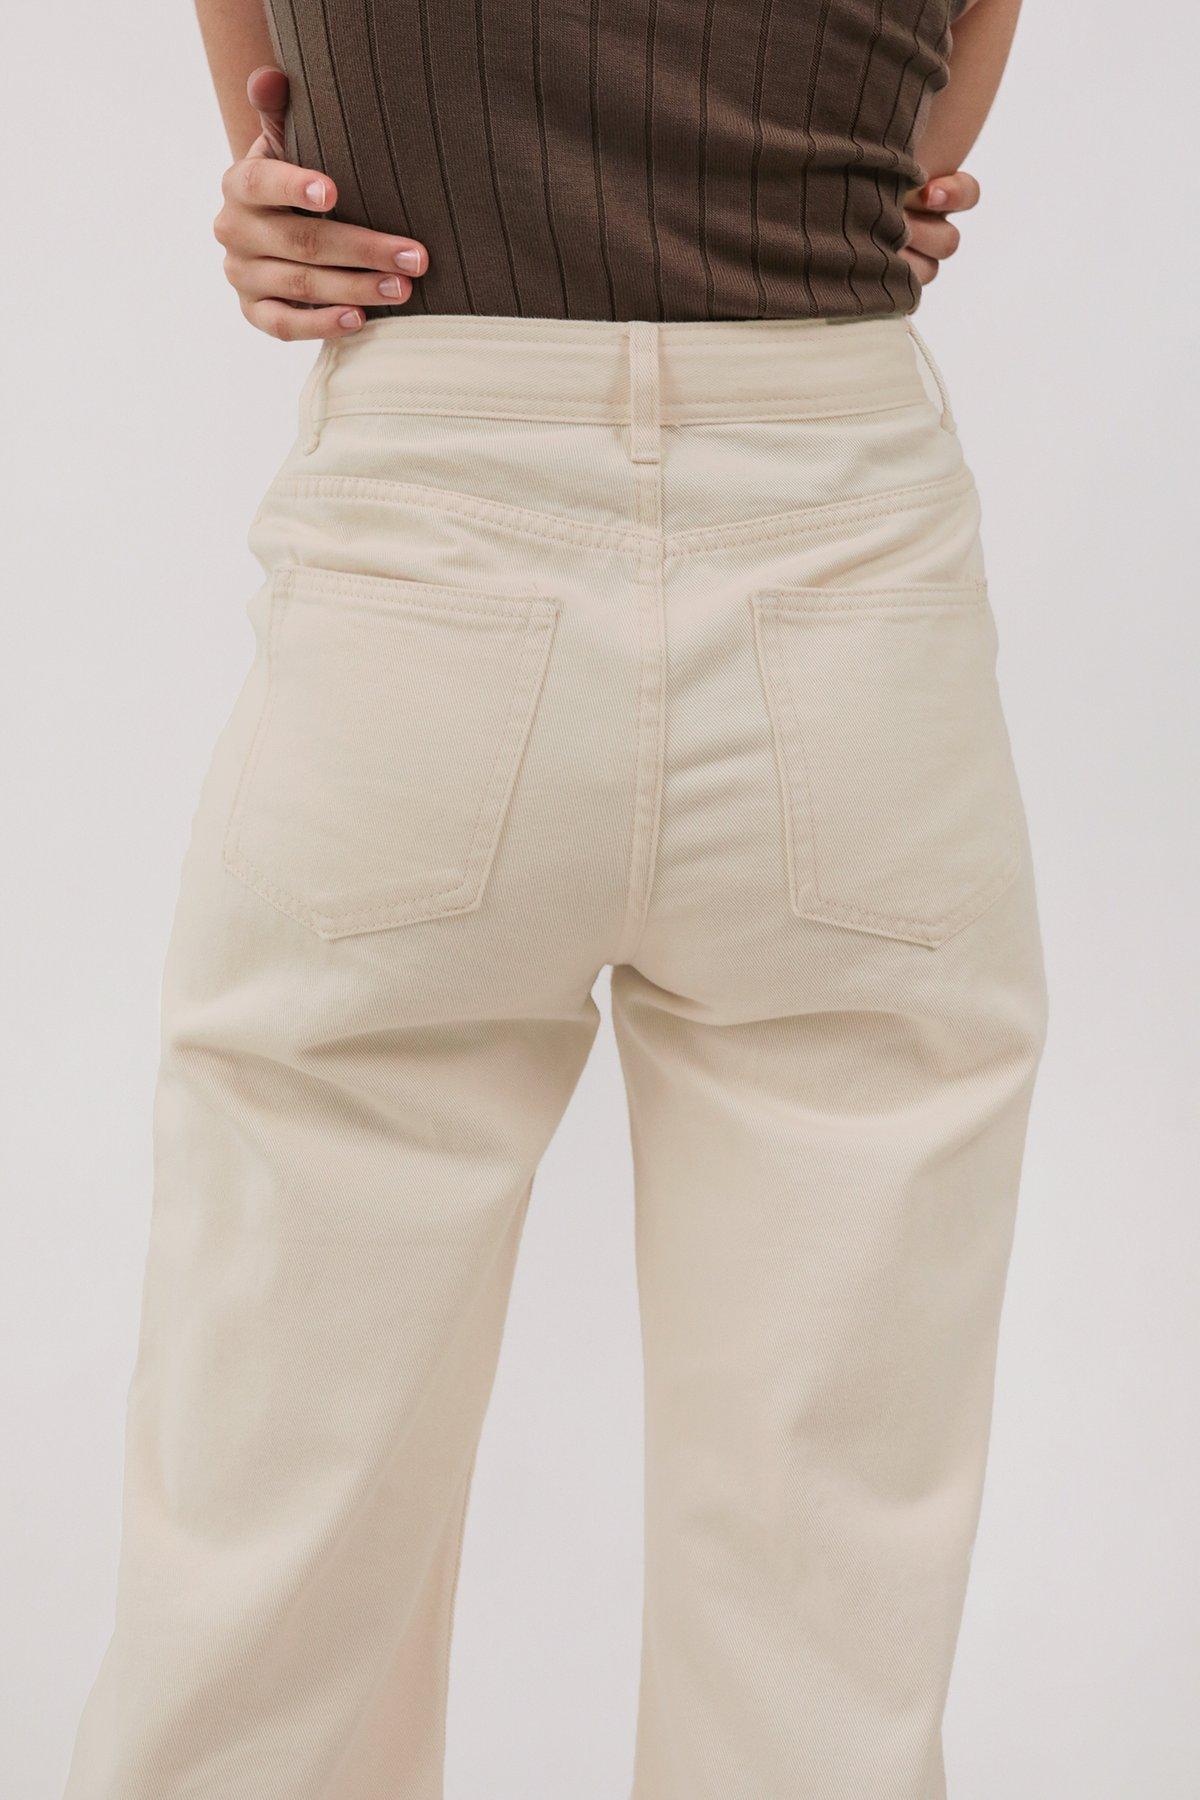 Newton Straight Leg Jeans (Oat)